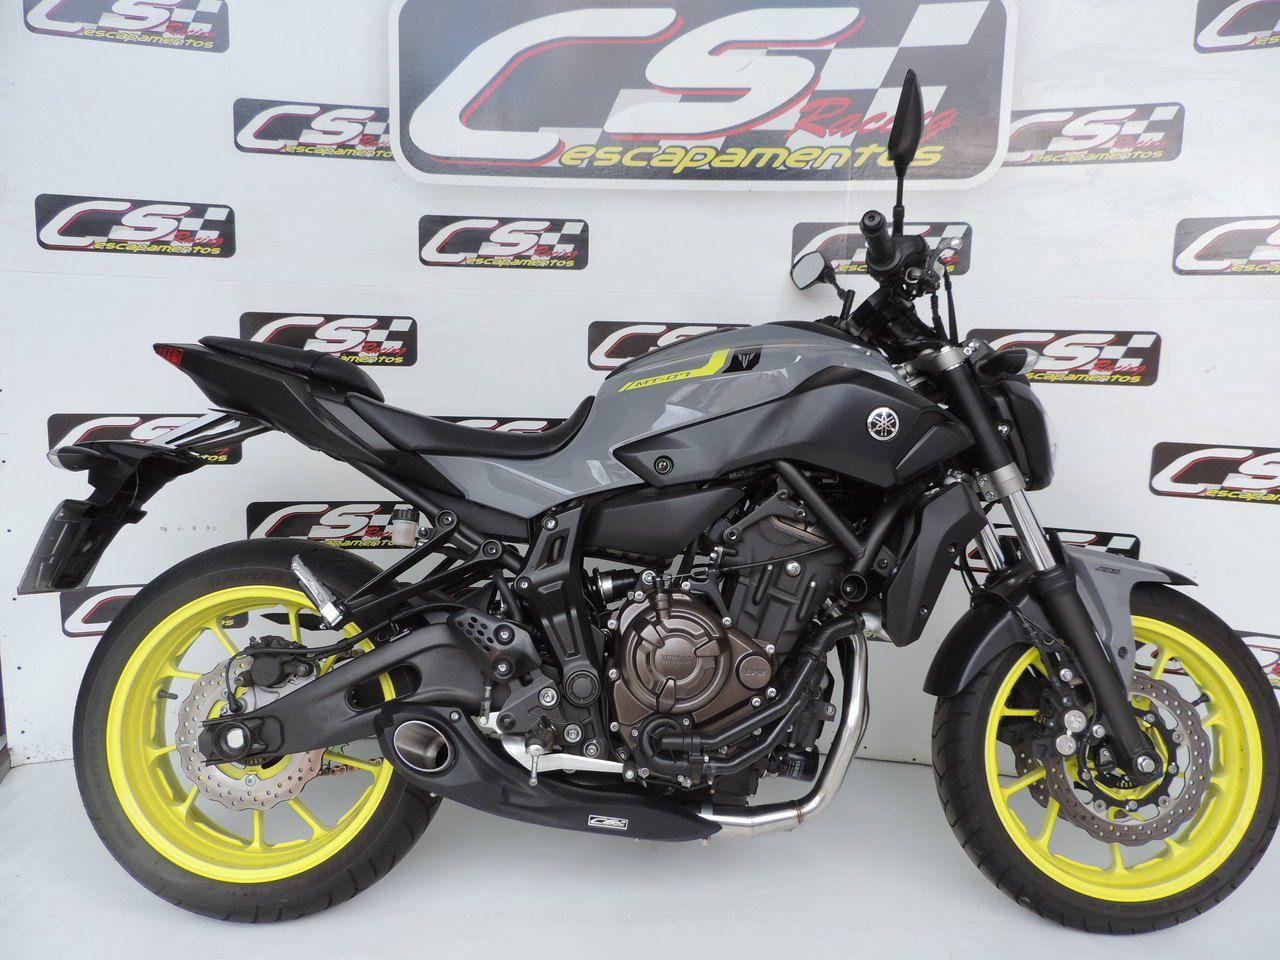 Escapamento Esportivo Full | CS Racing | Yamaha MT-07